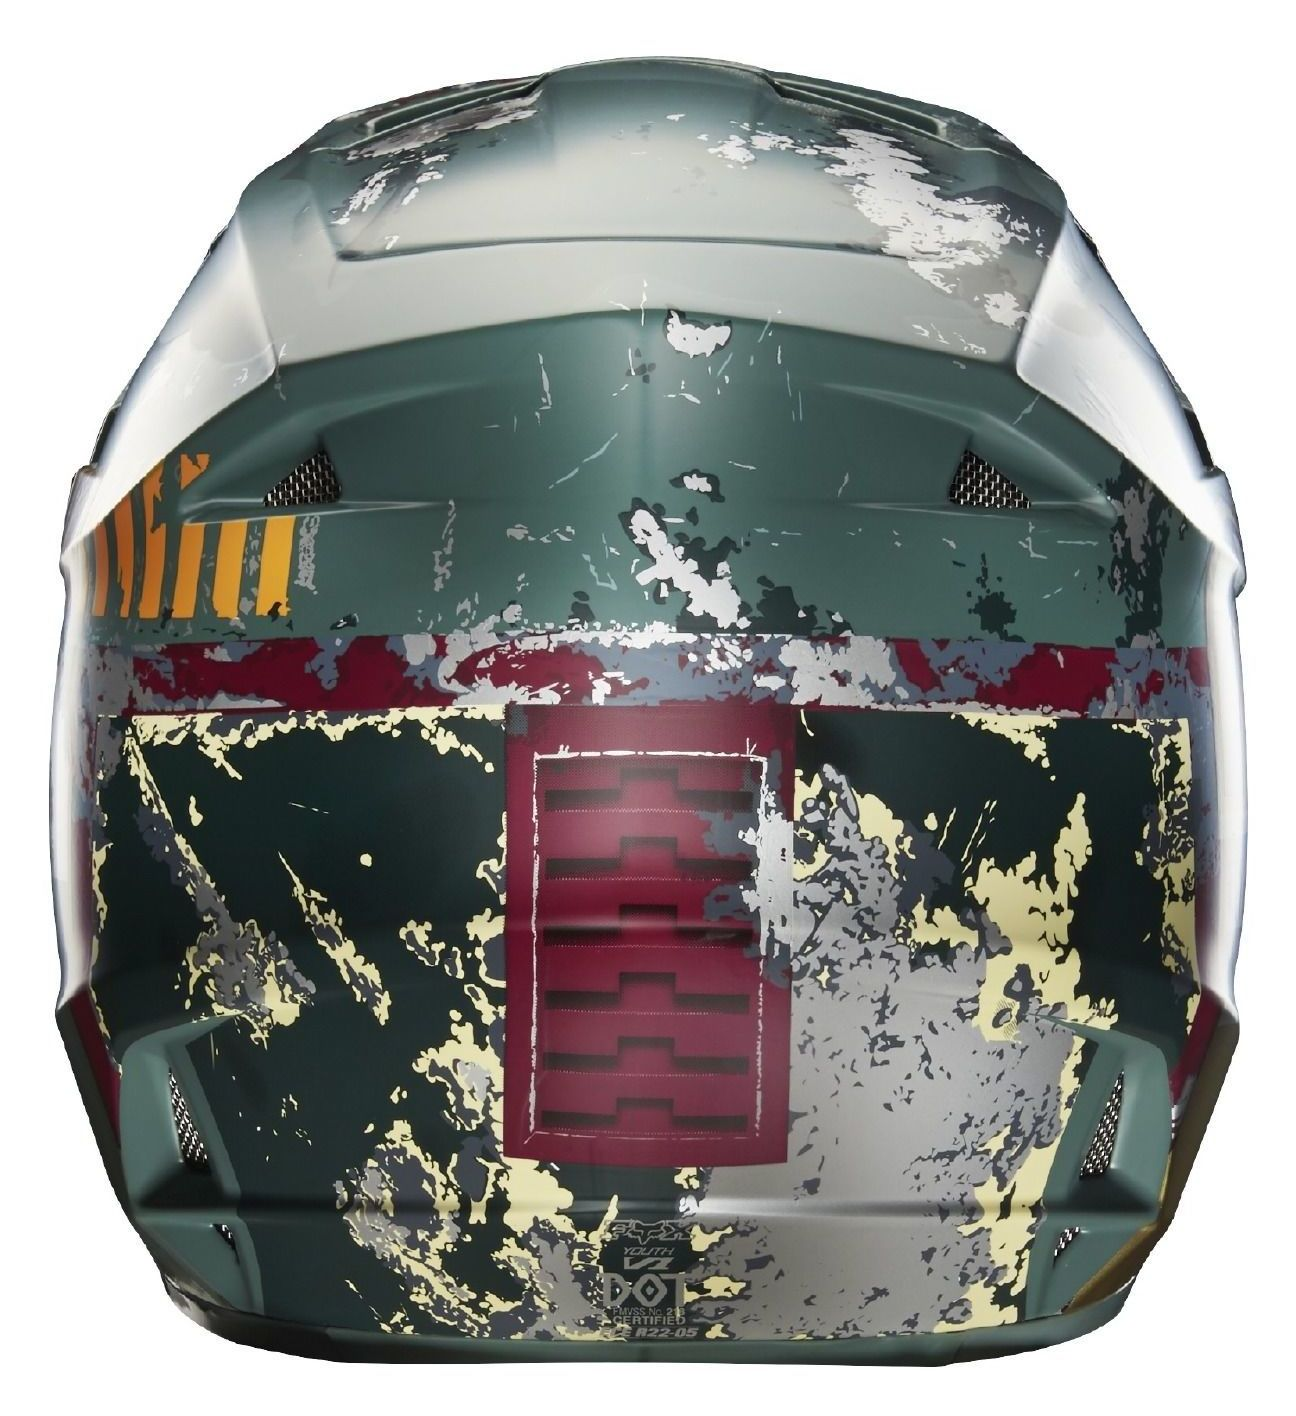 4a52483c6 Fox Racing Youth V1 Boba Fett LE Helmet - Cycle Gear